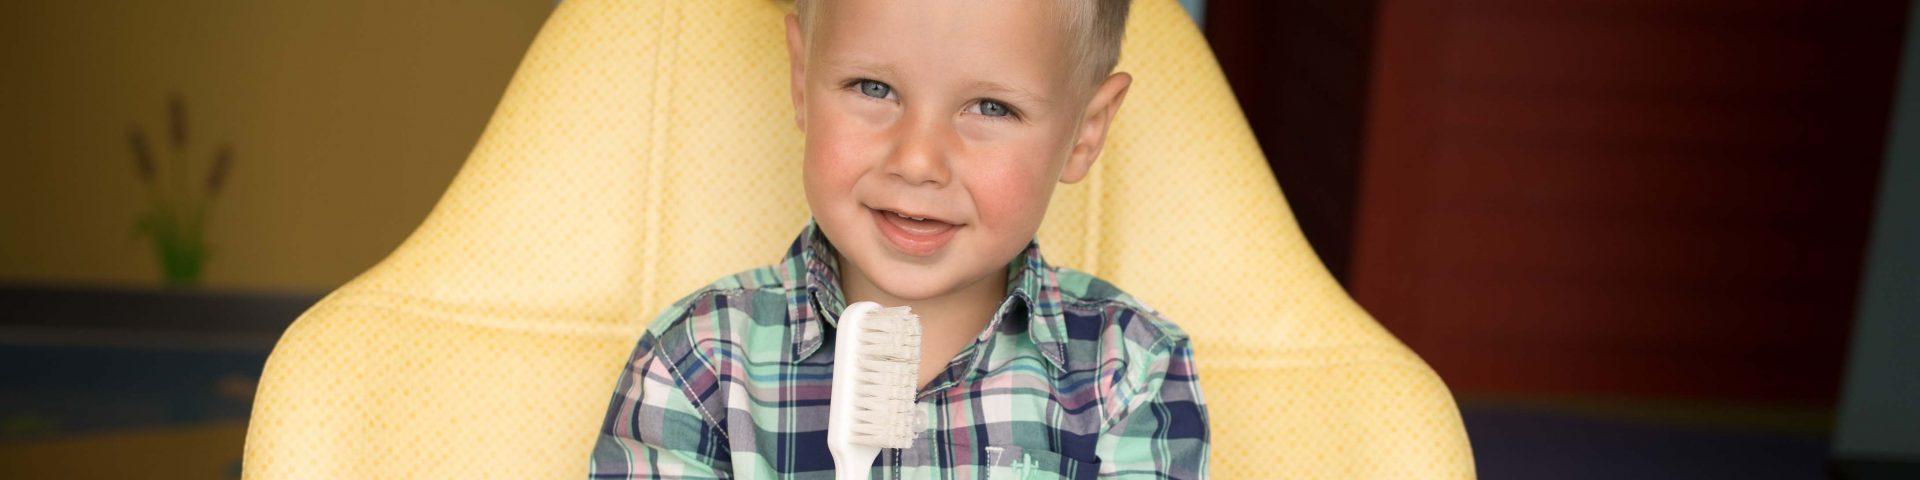 Child's first dental visit in Hudson, WI